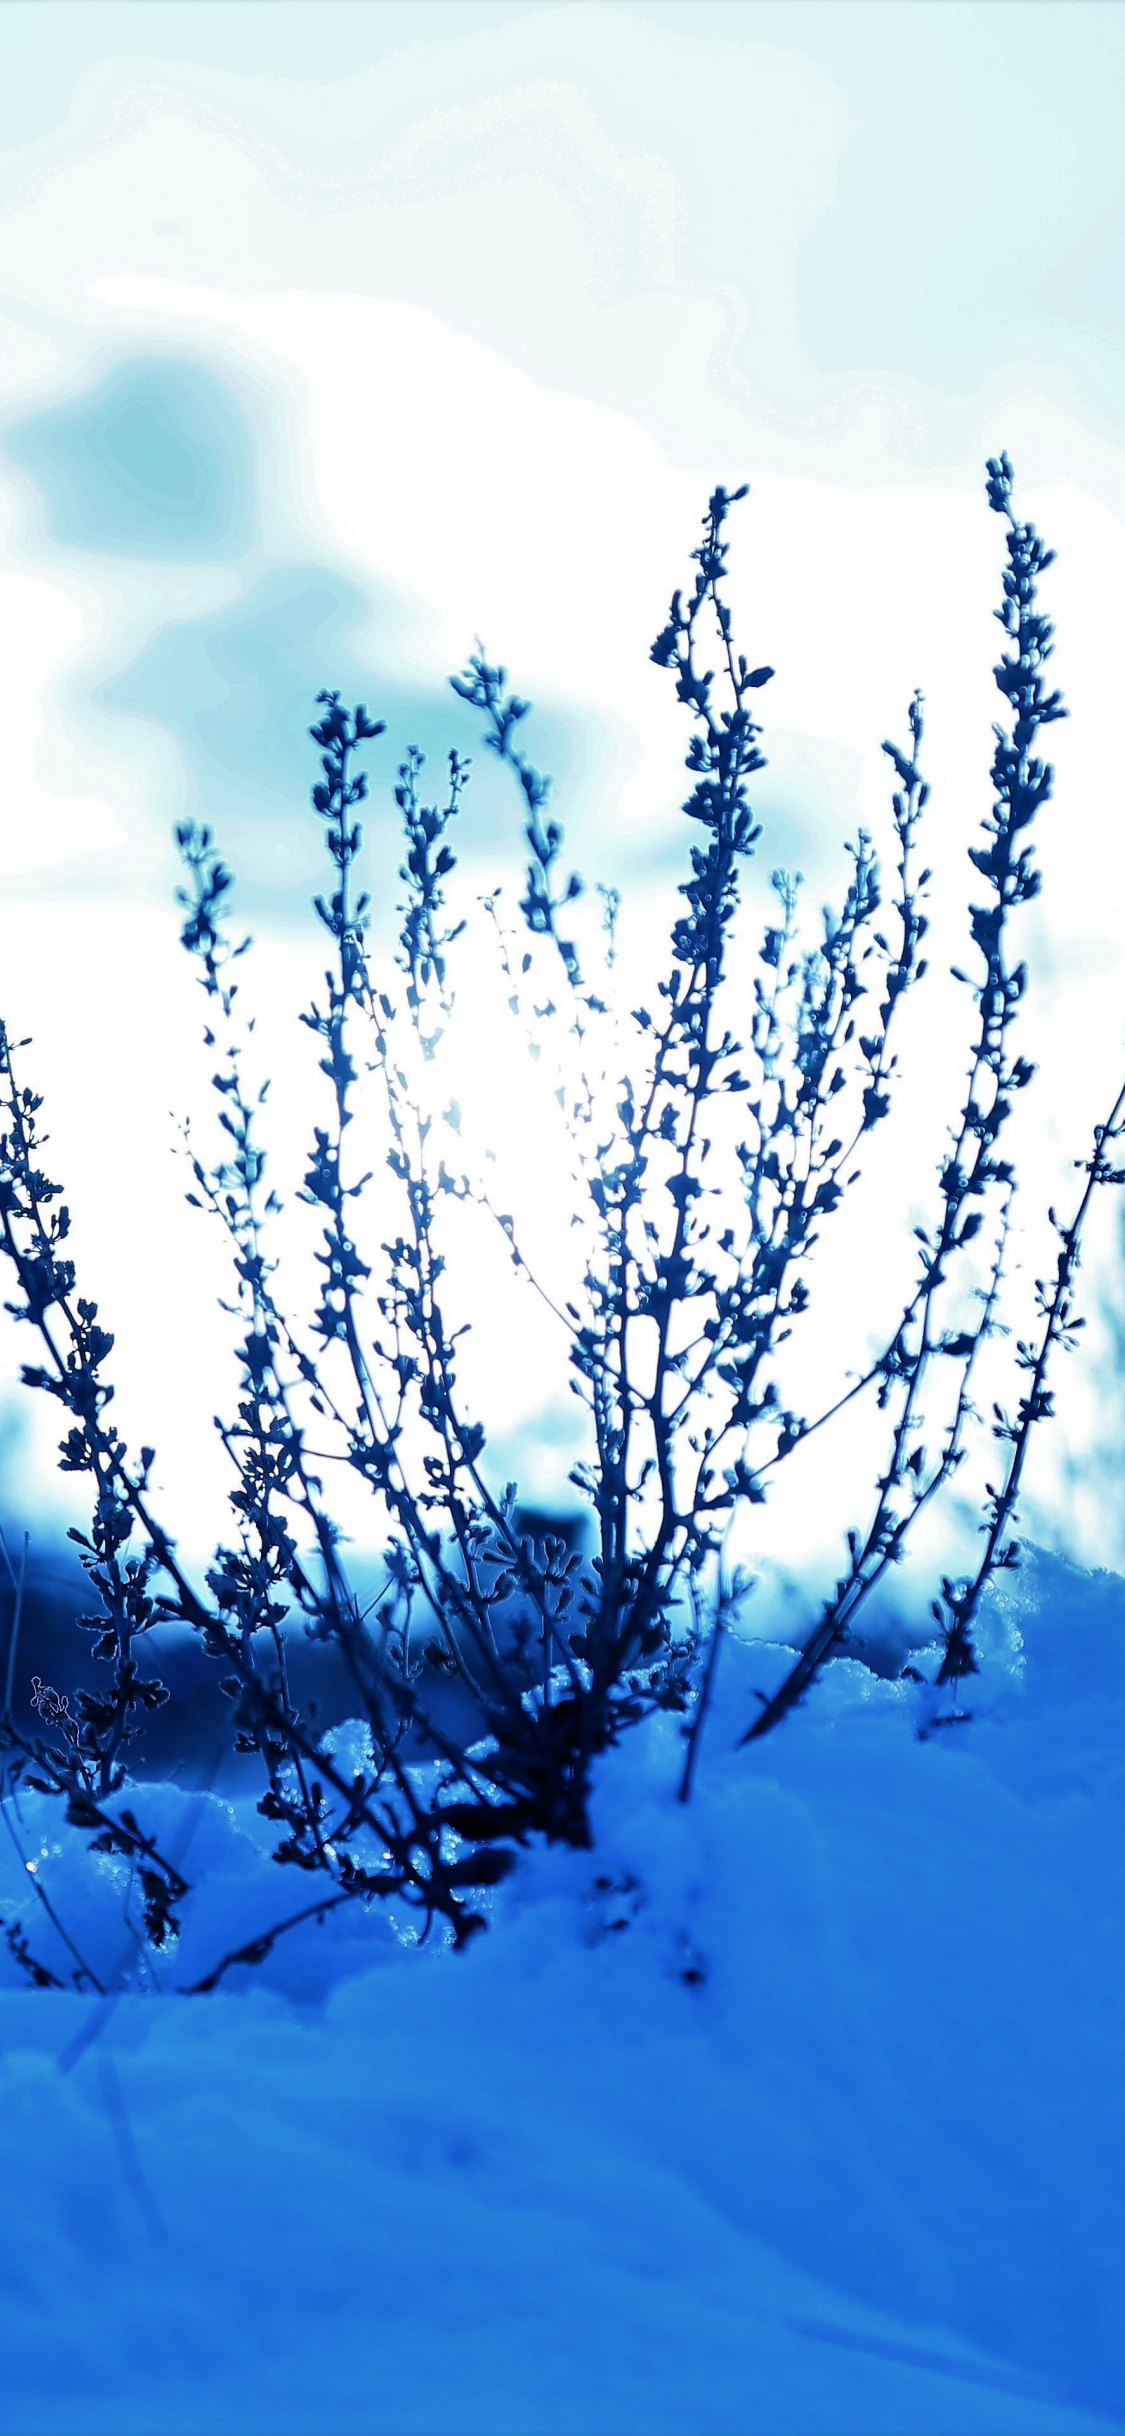 Download 1125x2436 wallpaper snow cover, plants, winter, landscape ...